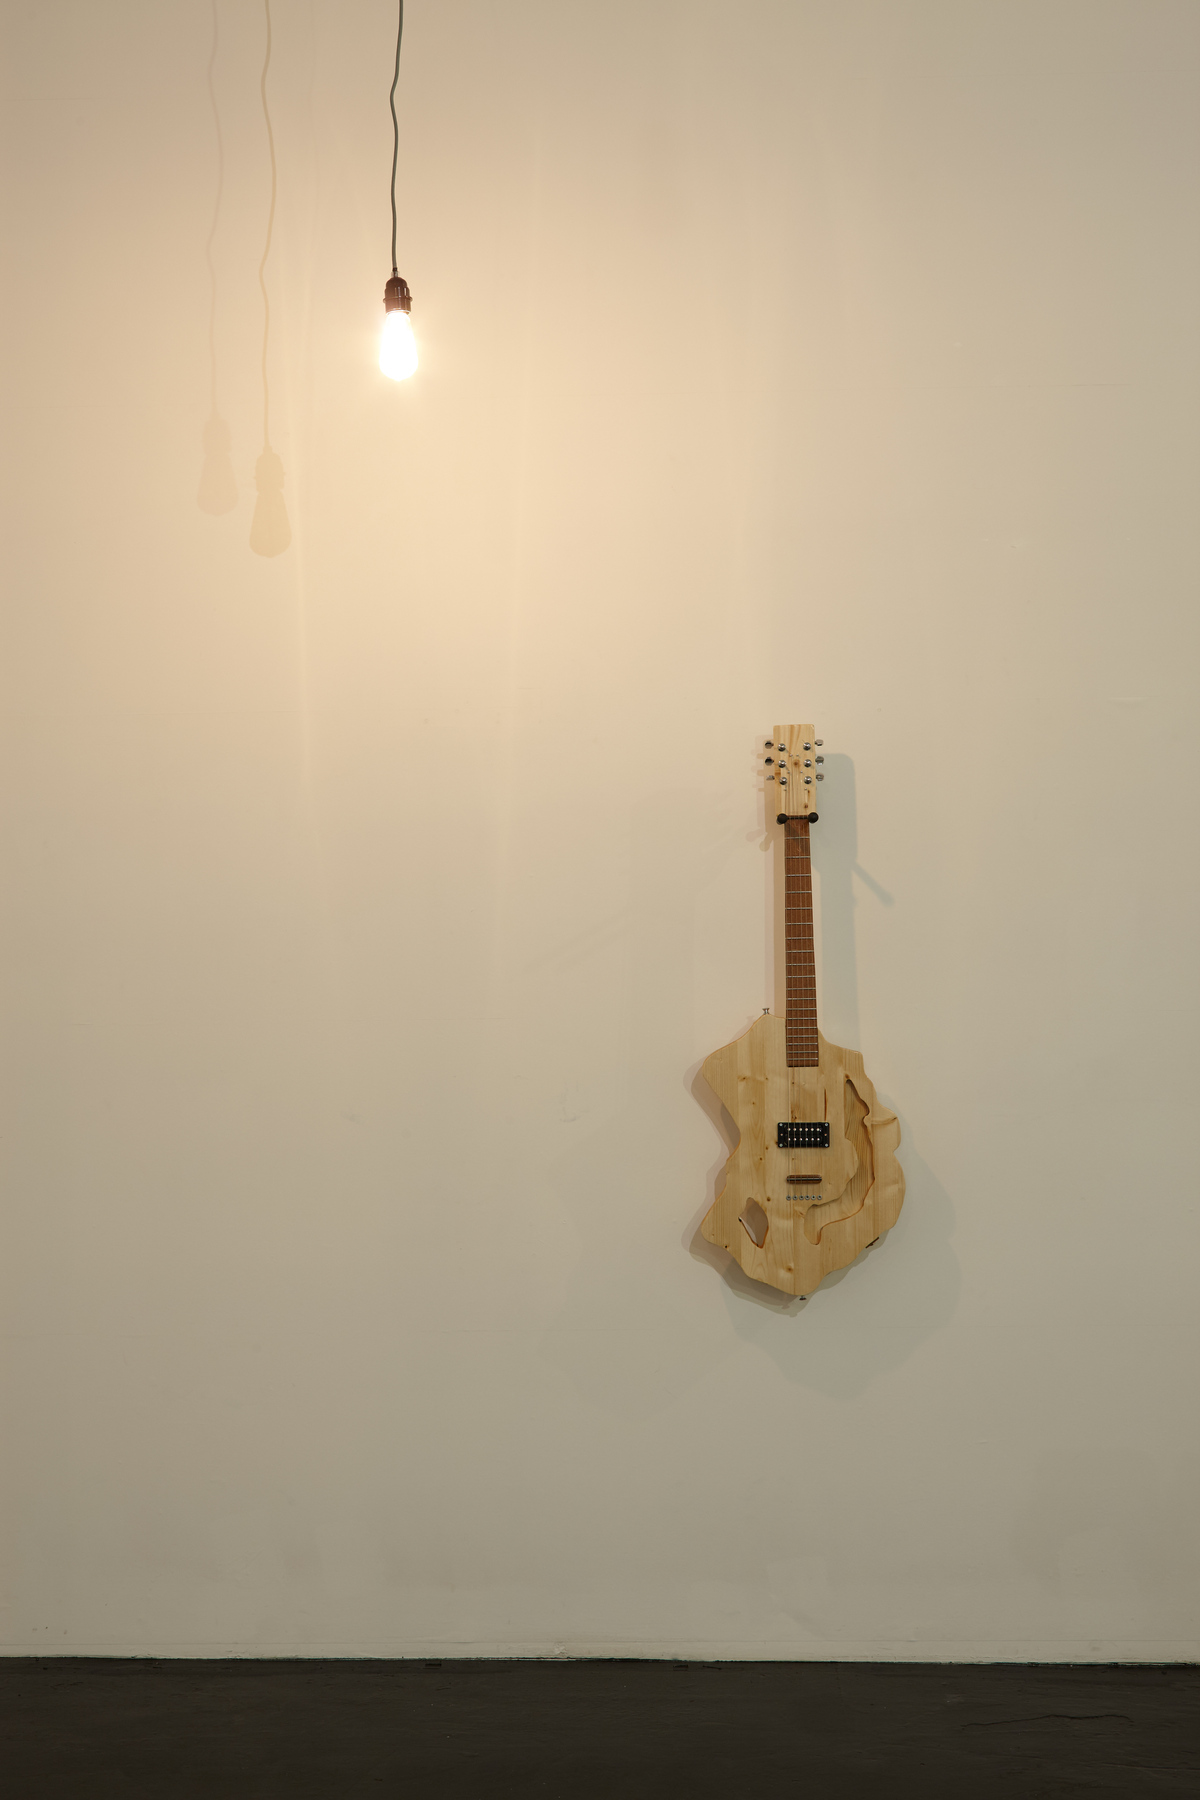 Flavio Merlo - Guitar IV, (detail) 2015